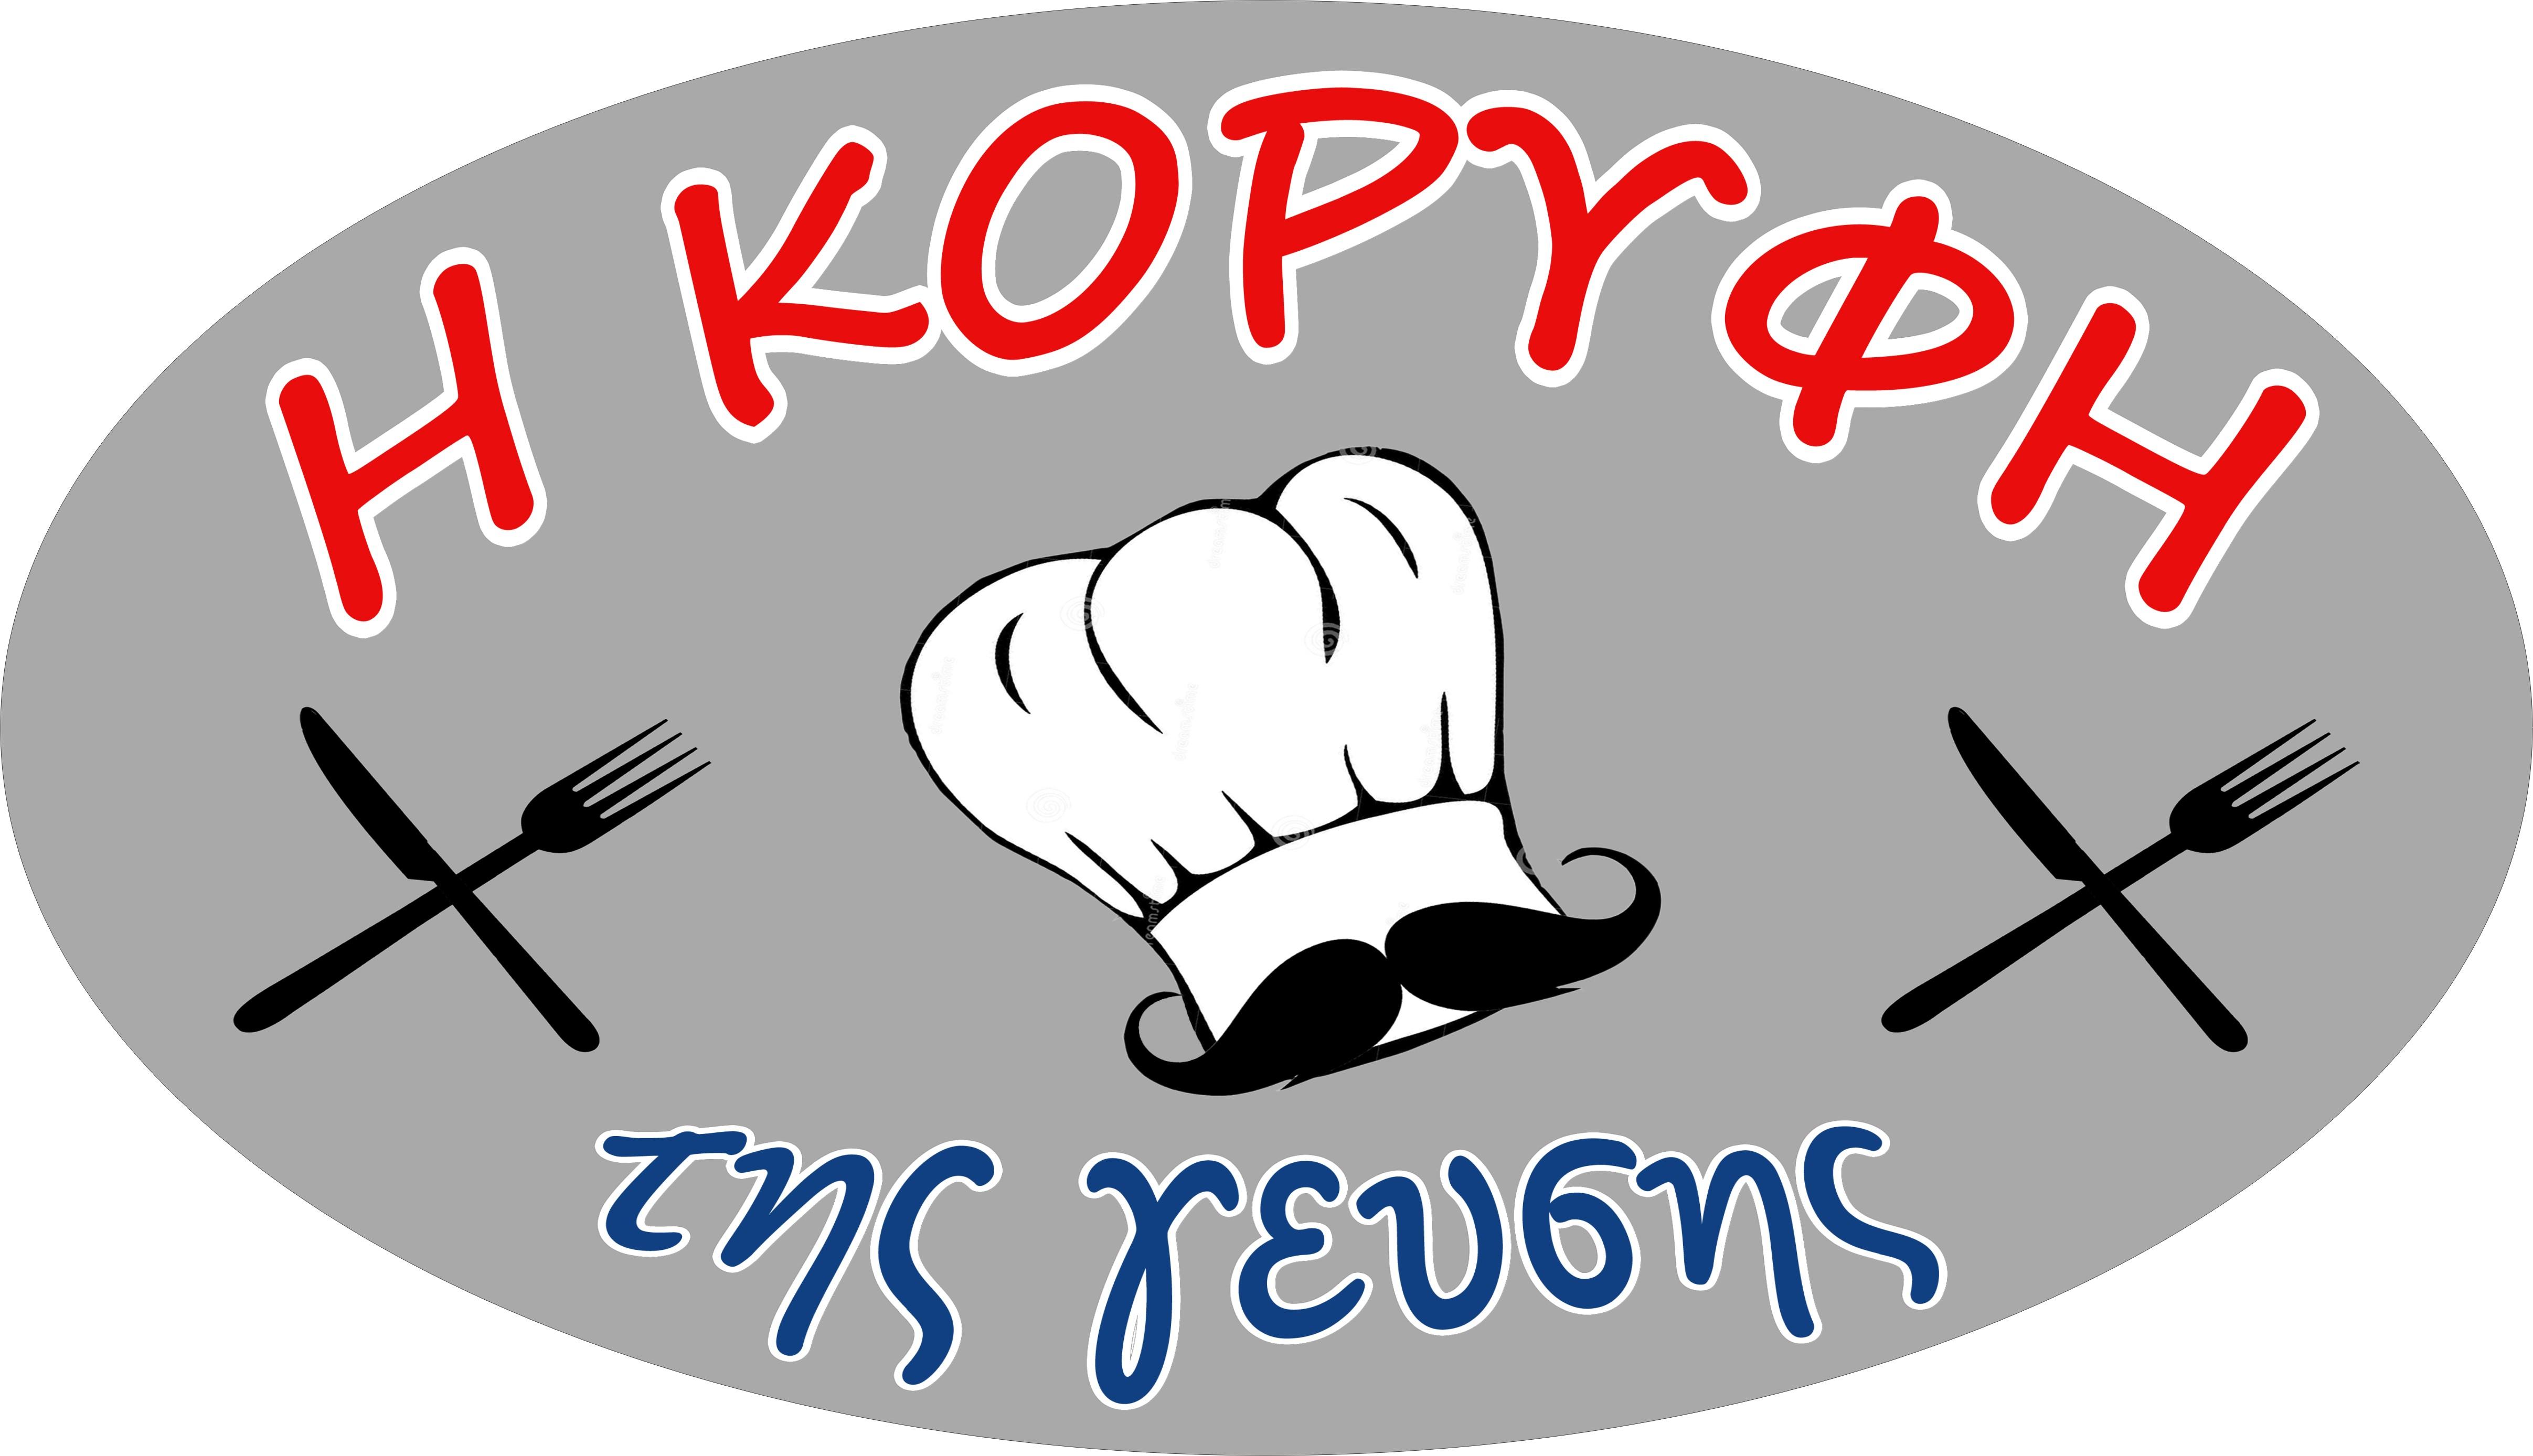 www.facebook.com/korufhthsgeusis